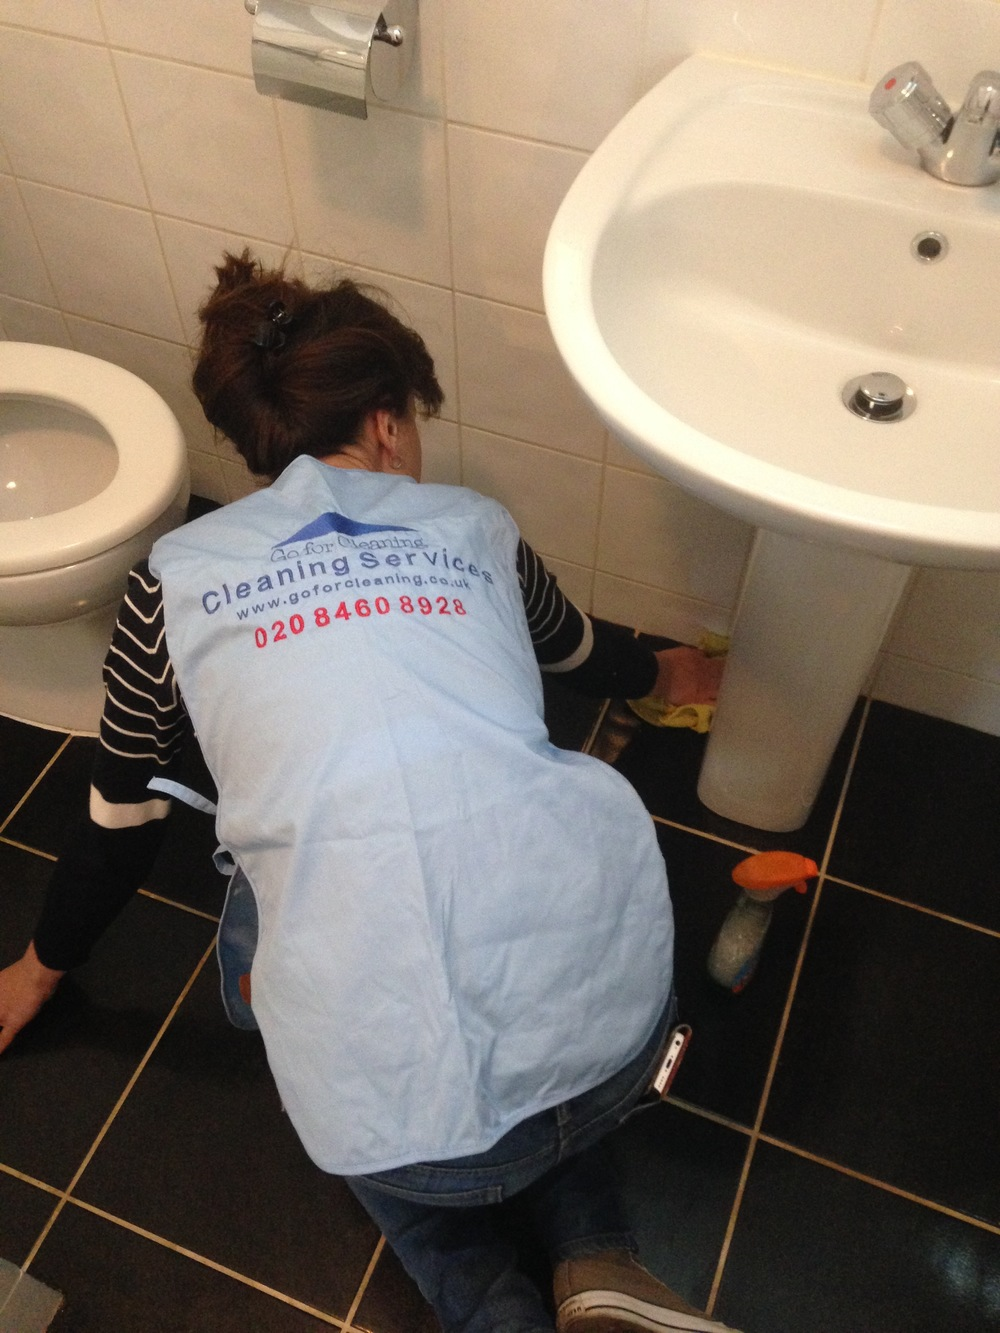 professional bathroom cleaner.jpg